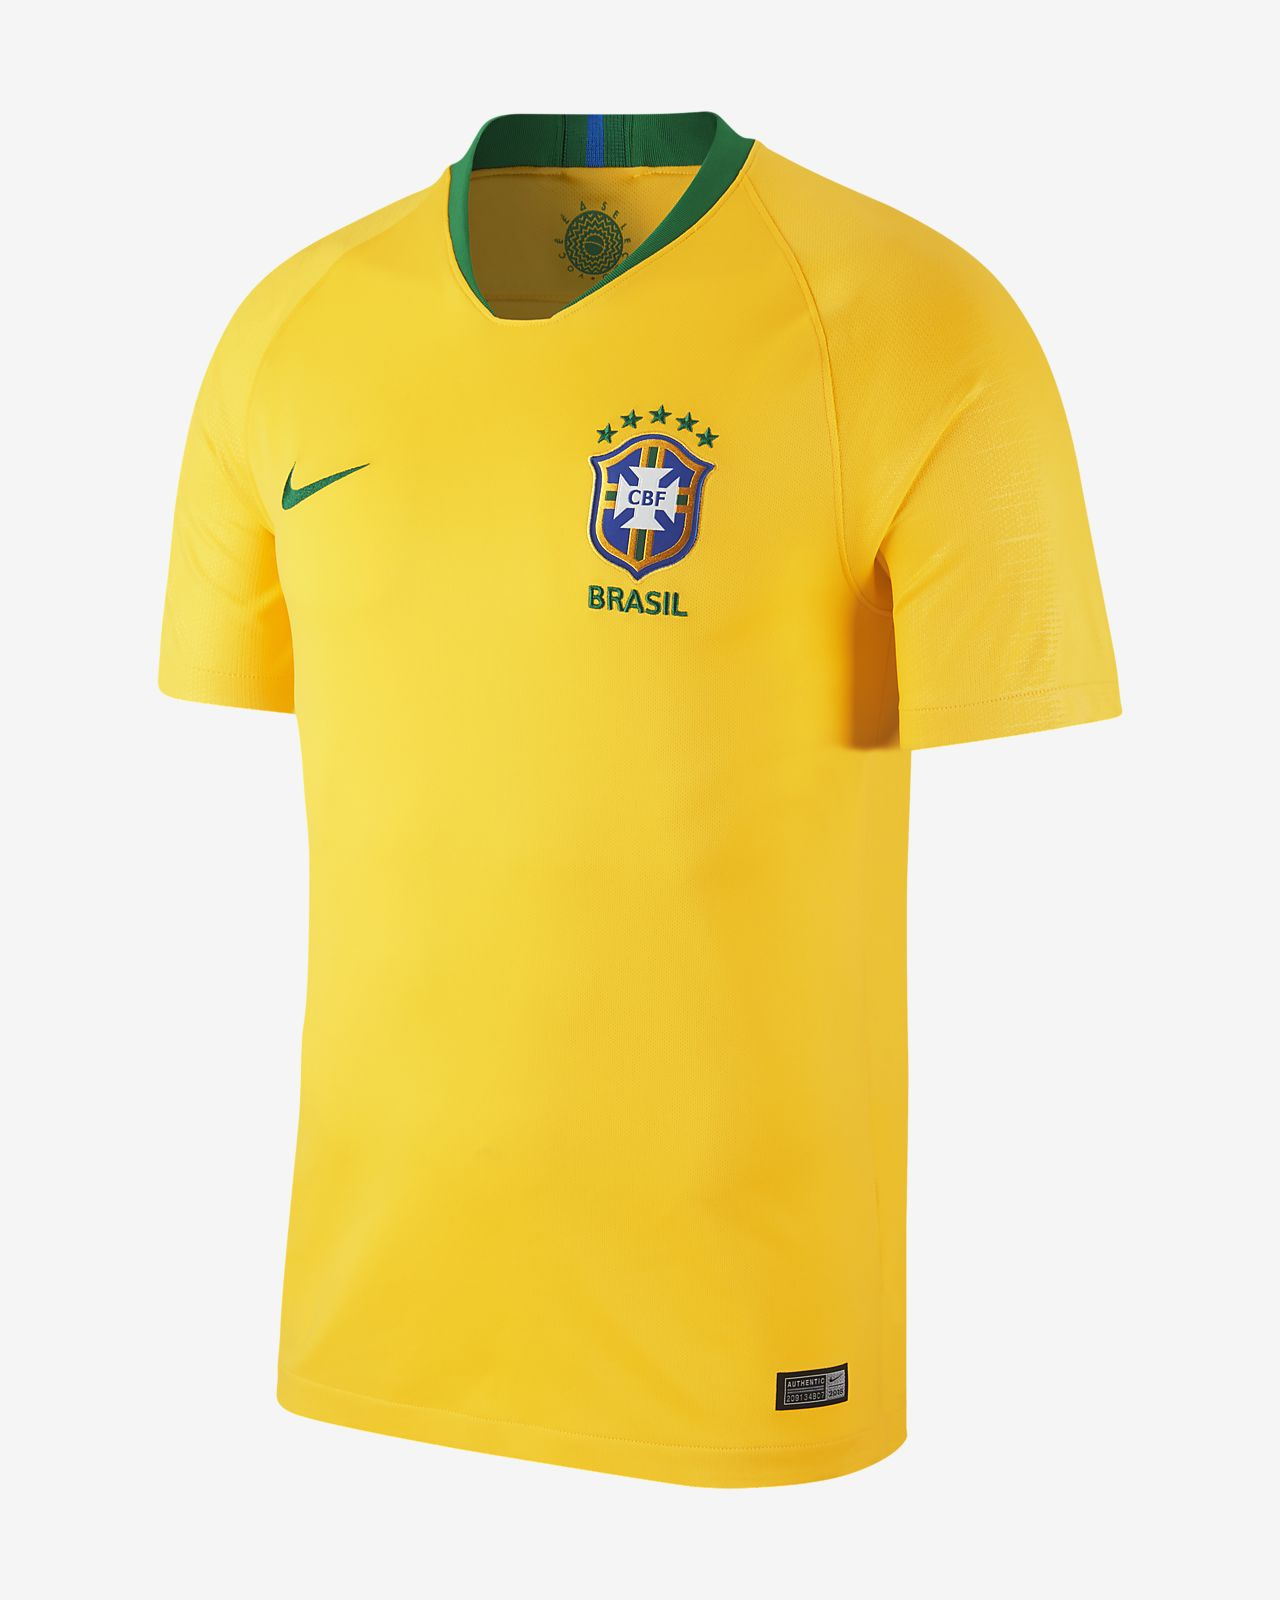 Camiseta de fútbol de local para hombre Stadium de Brasil CBF 2018